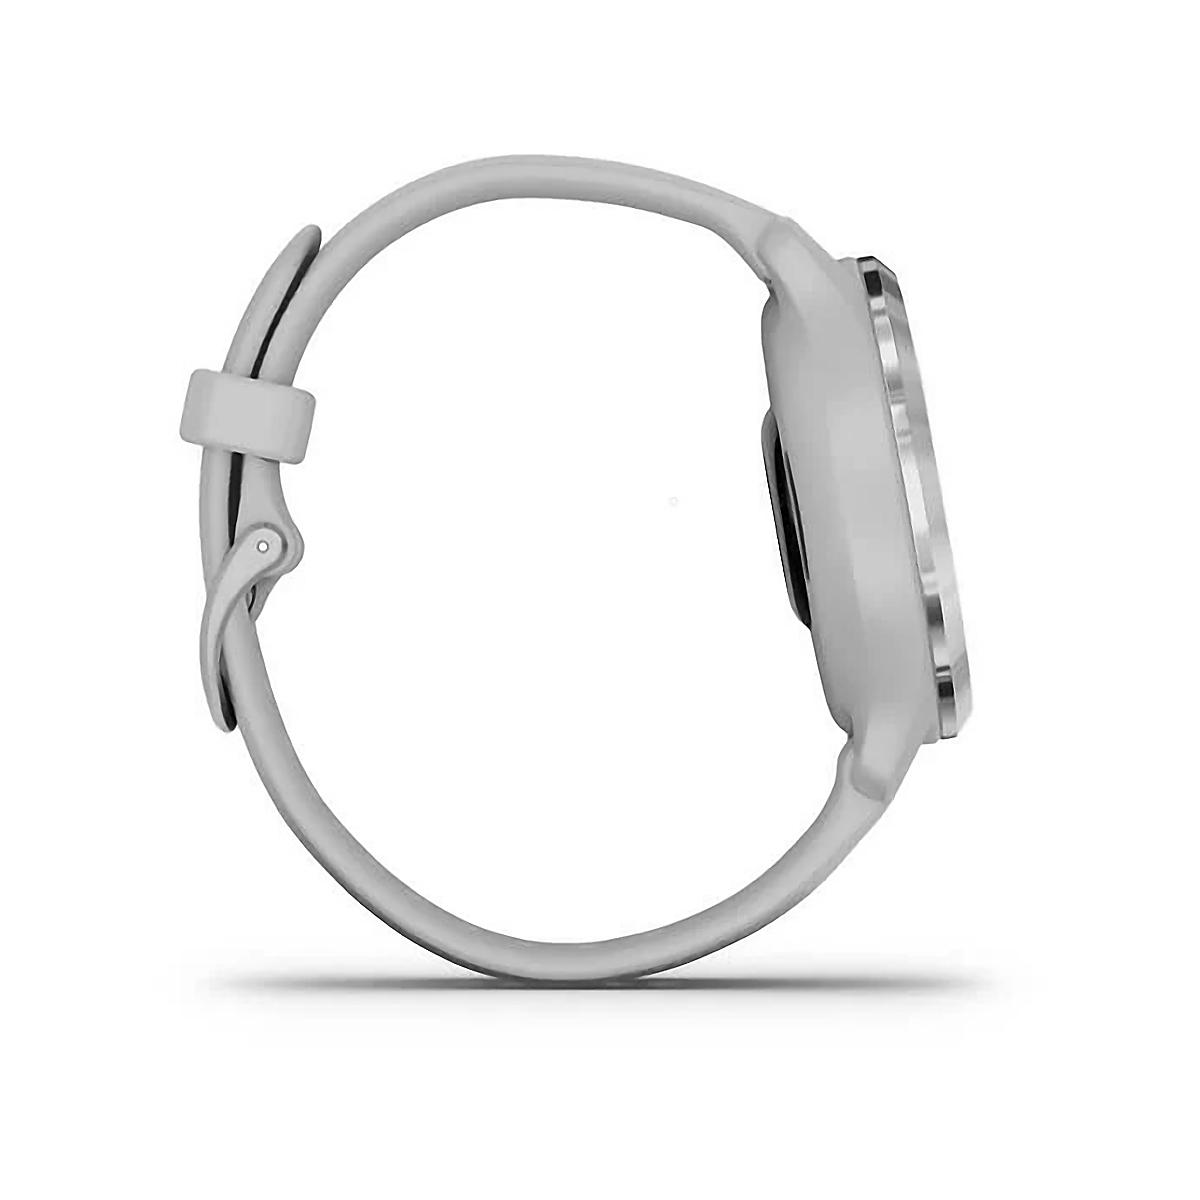 Garmin Venu 2S - Color: Mist Grey, Mist Grey, large, image 5